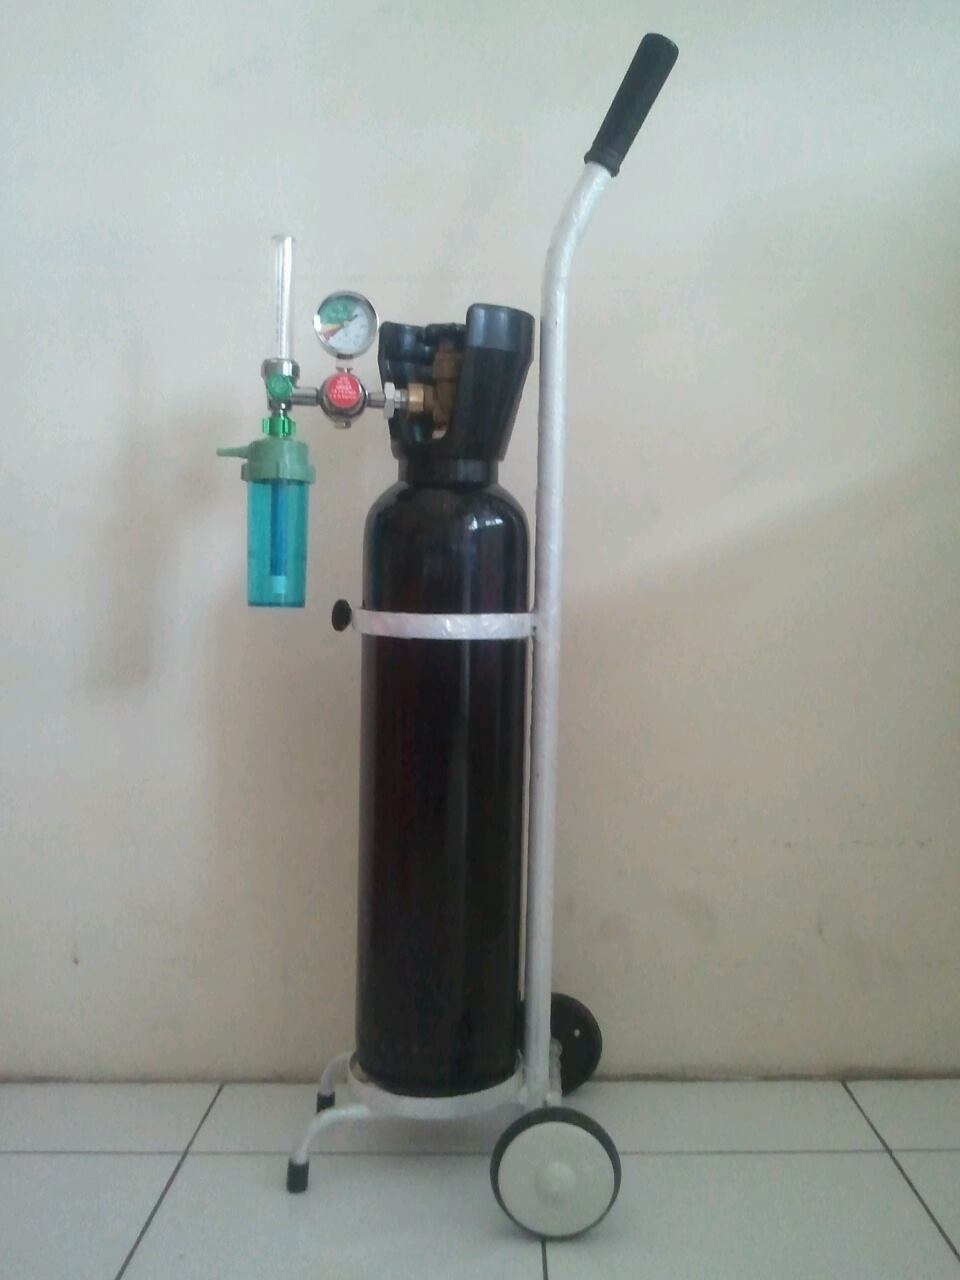 Tabung Gas Portable : Tabung oksigen medis